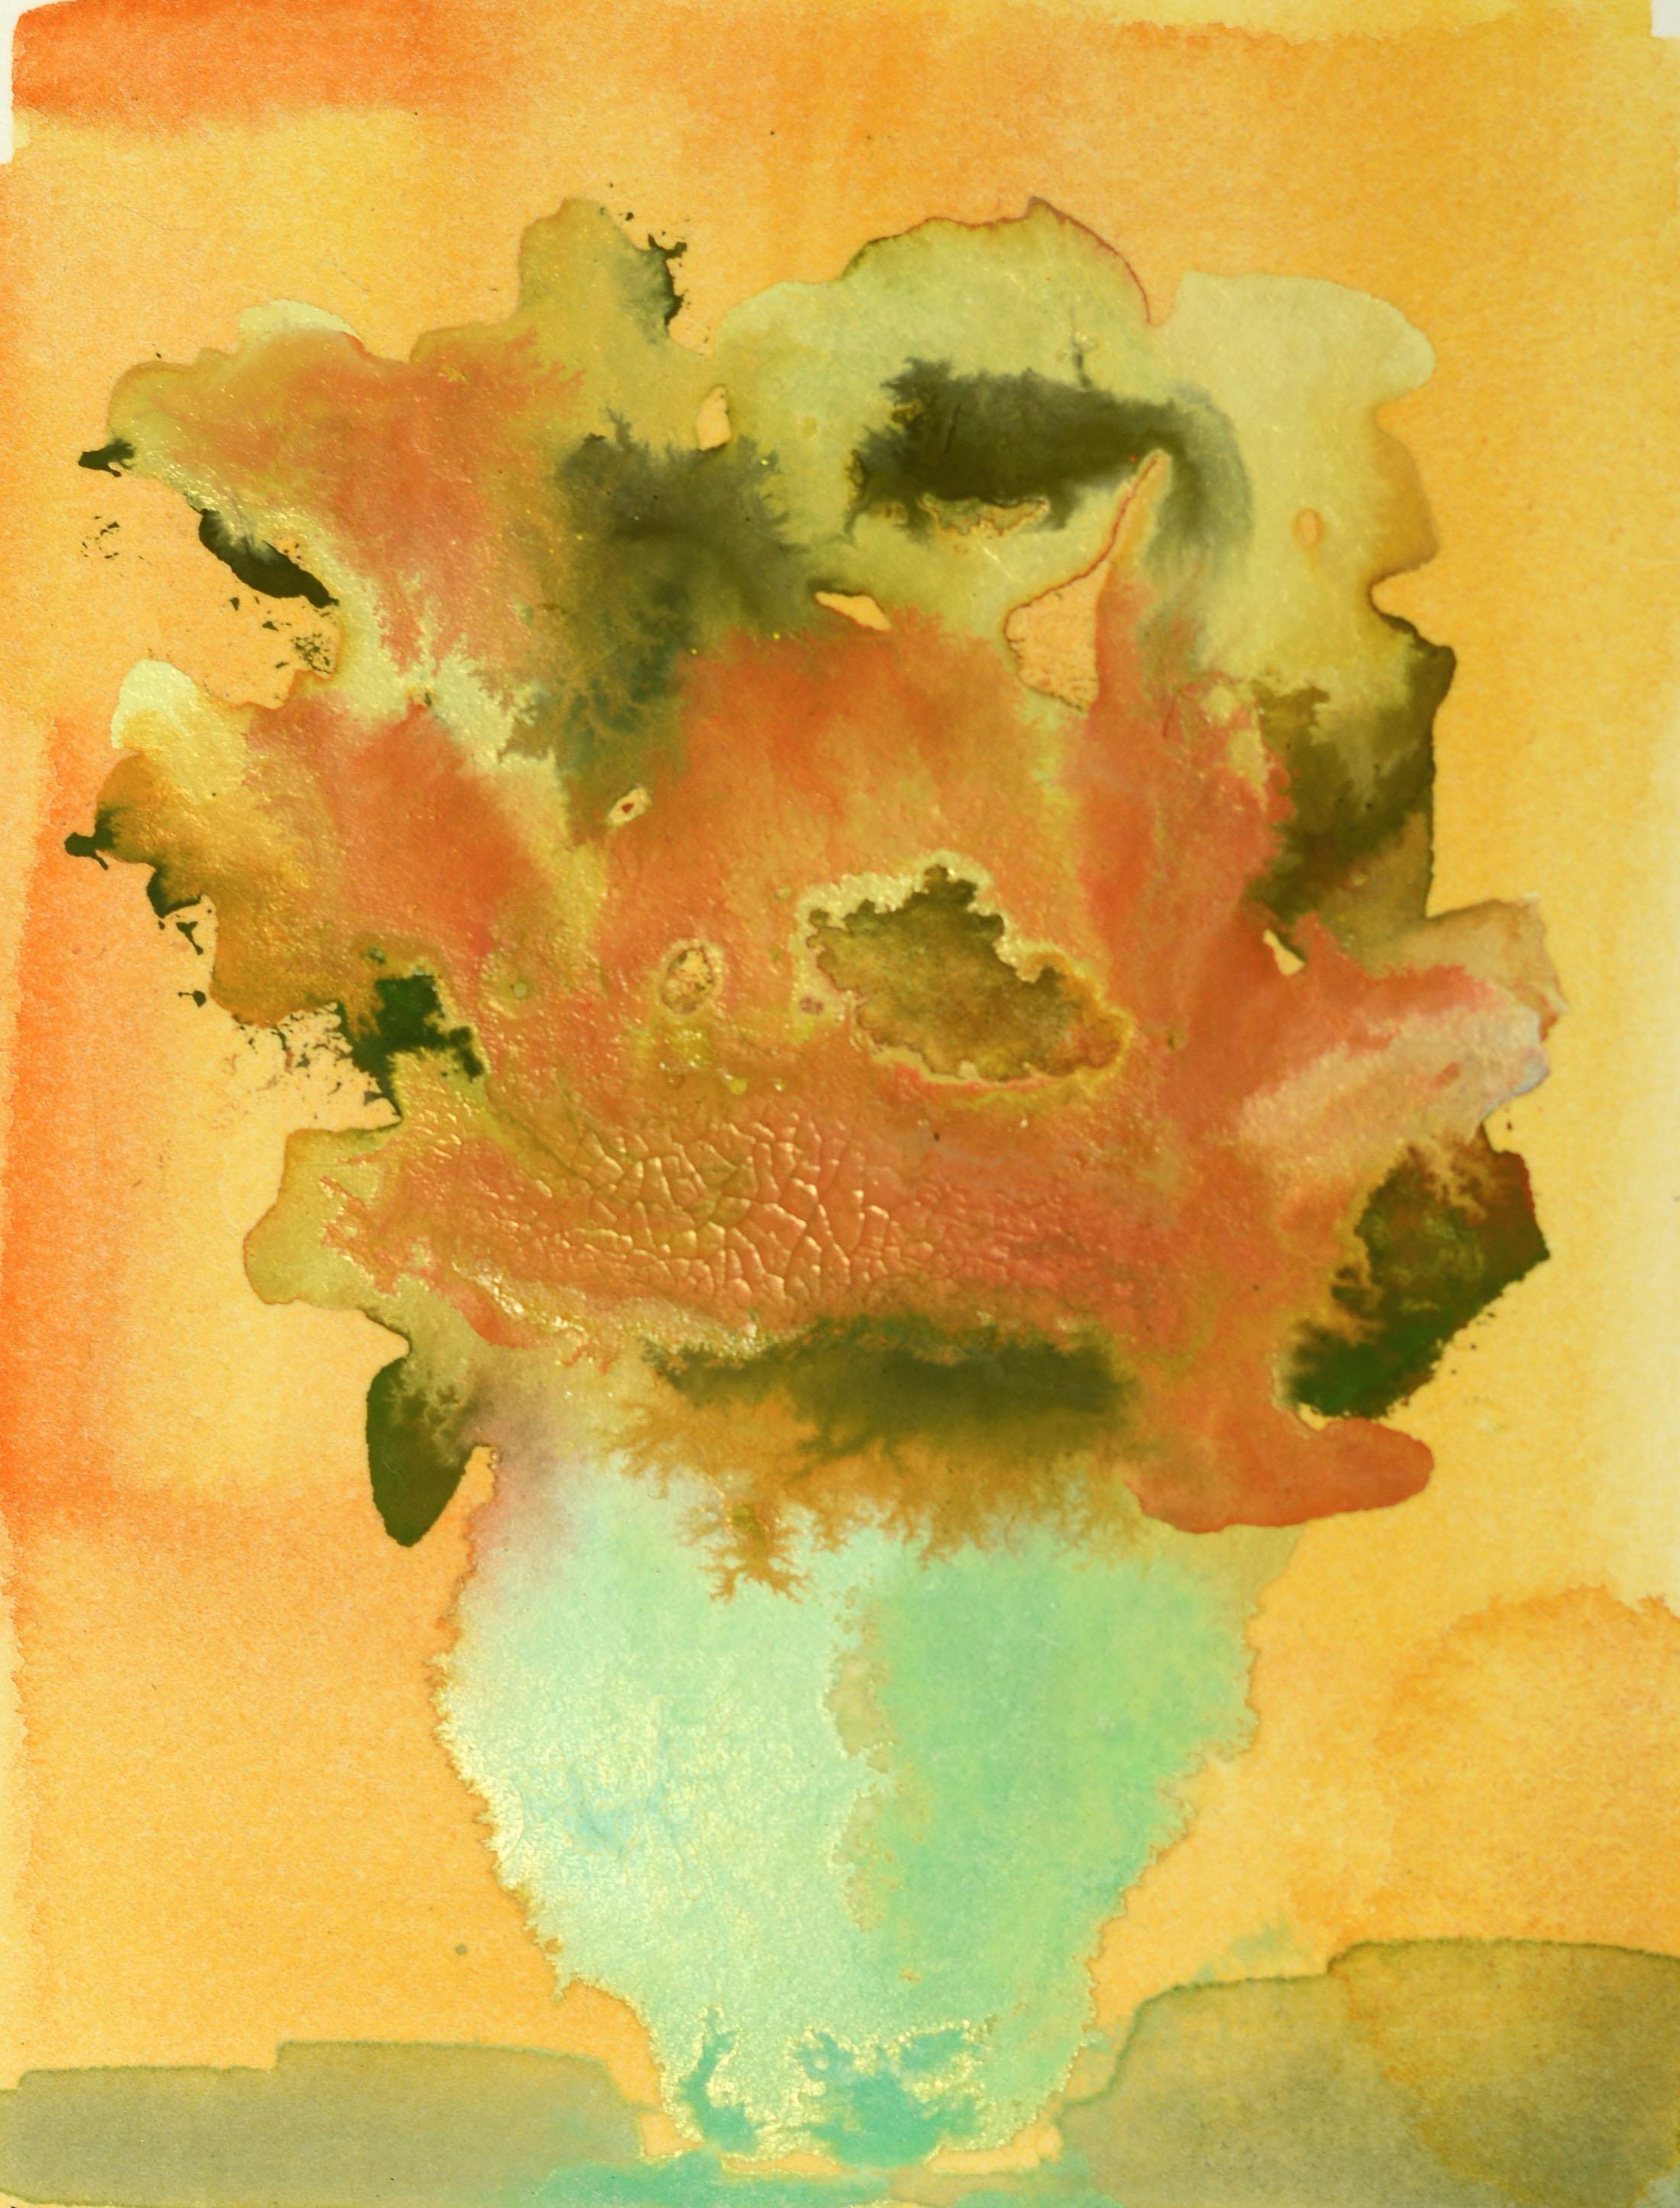 Rebecca_Kinkead_Sunflowers_4x3 inset on 11 x 7.5 paper.jpg